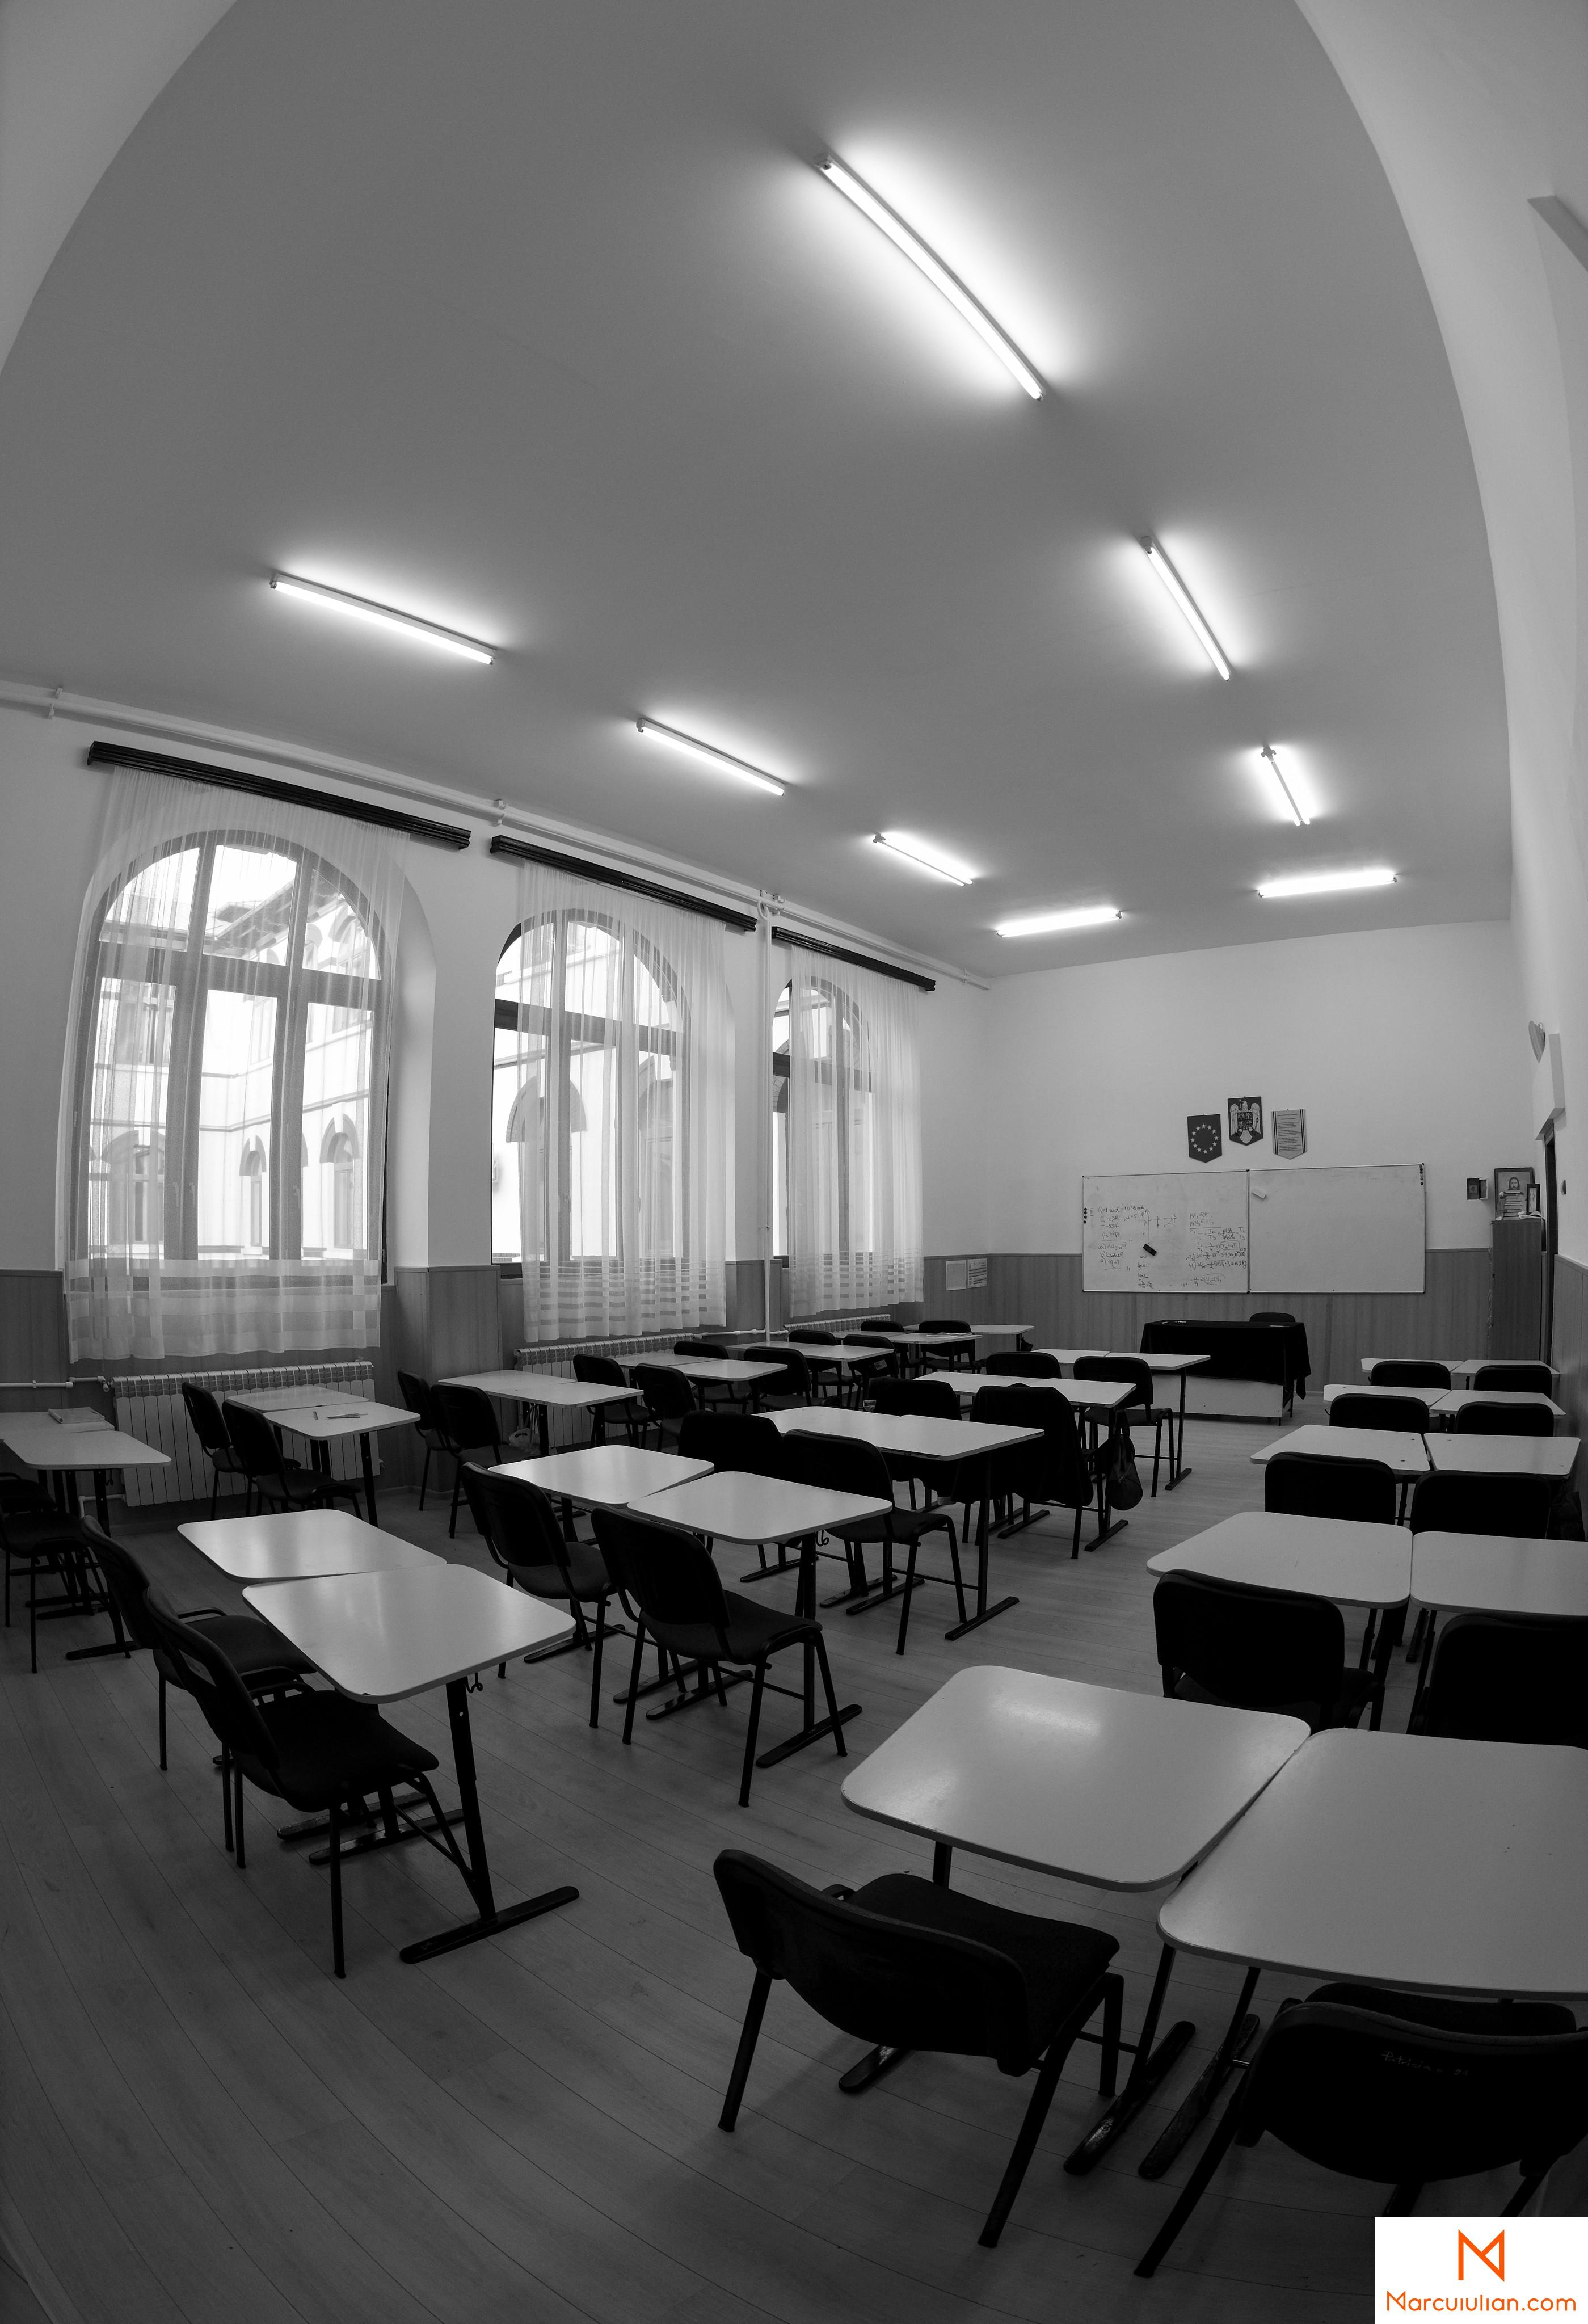 interioare, interior, liceu, colegiu